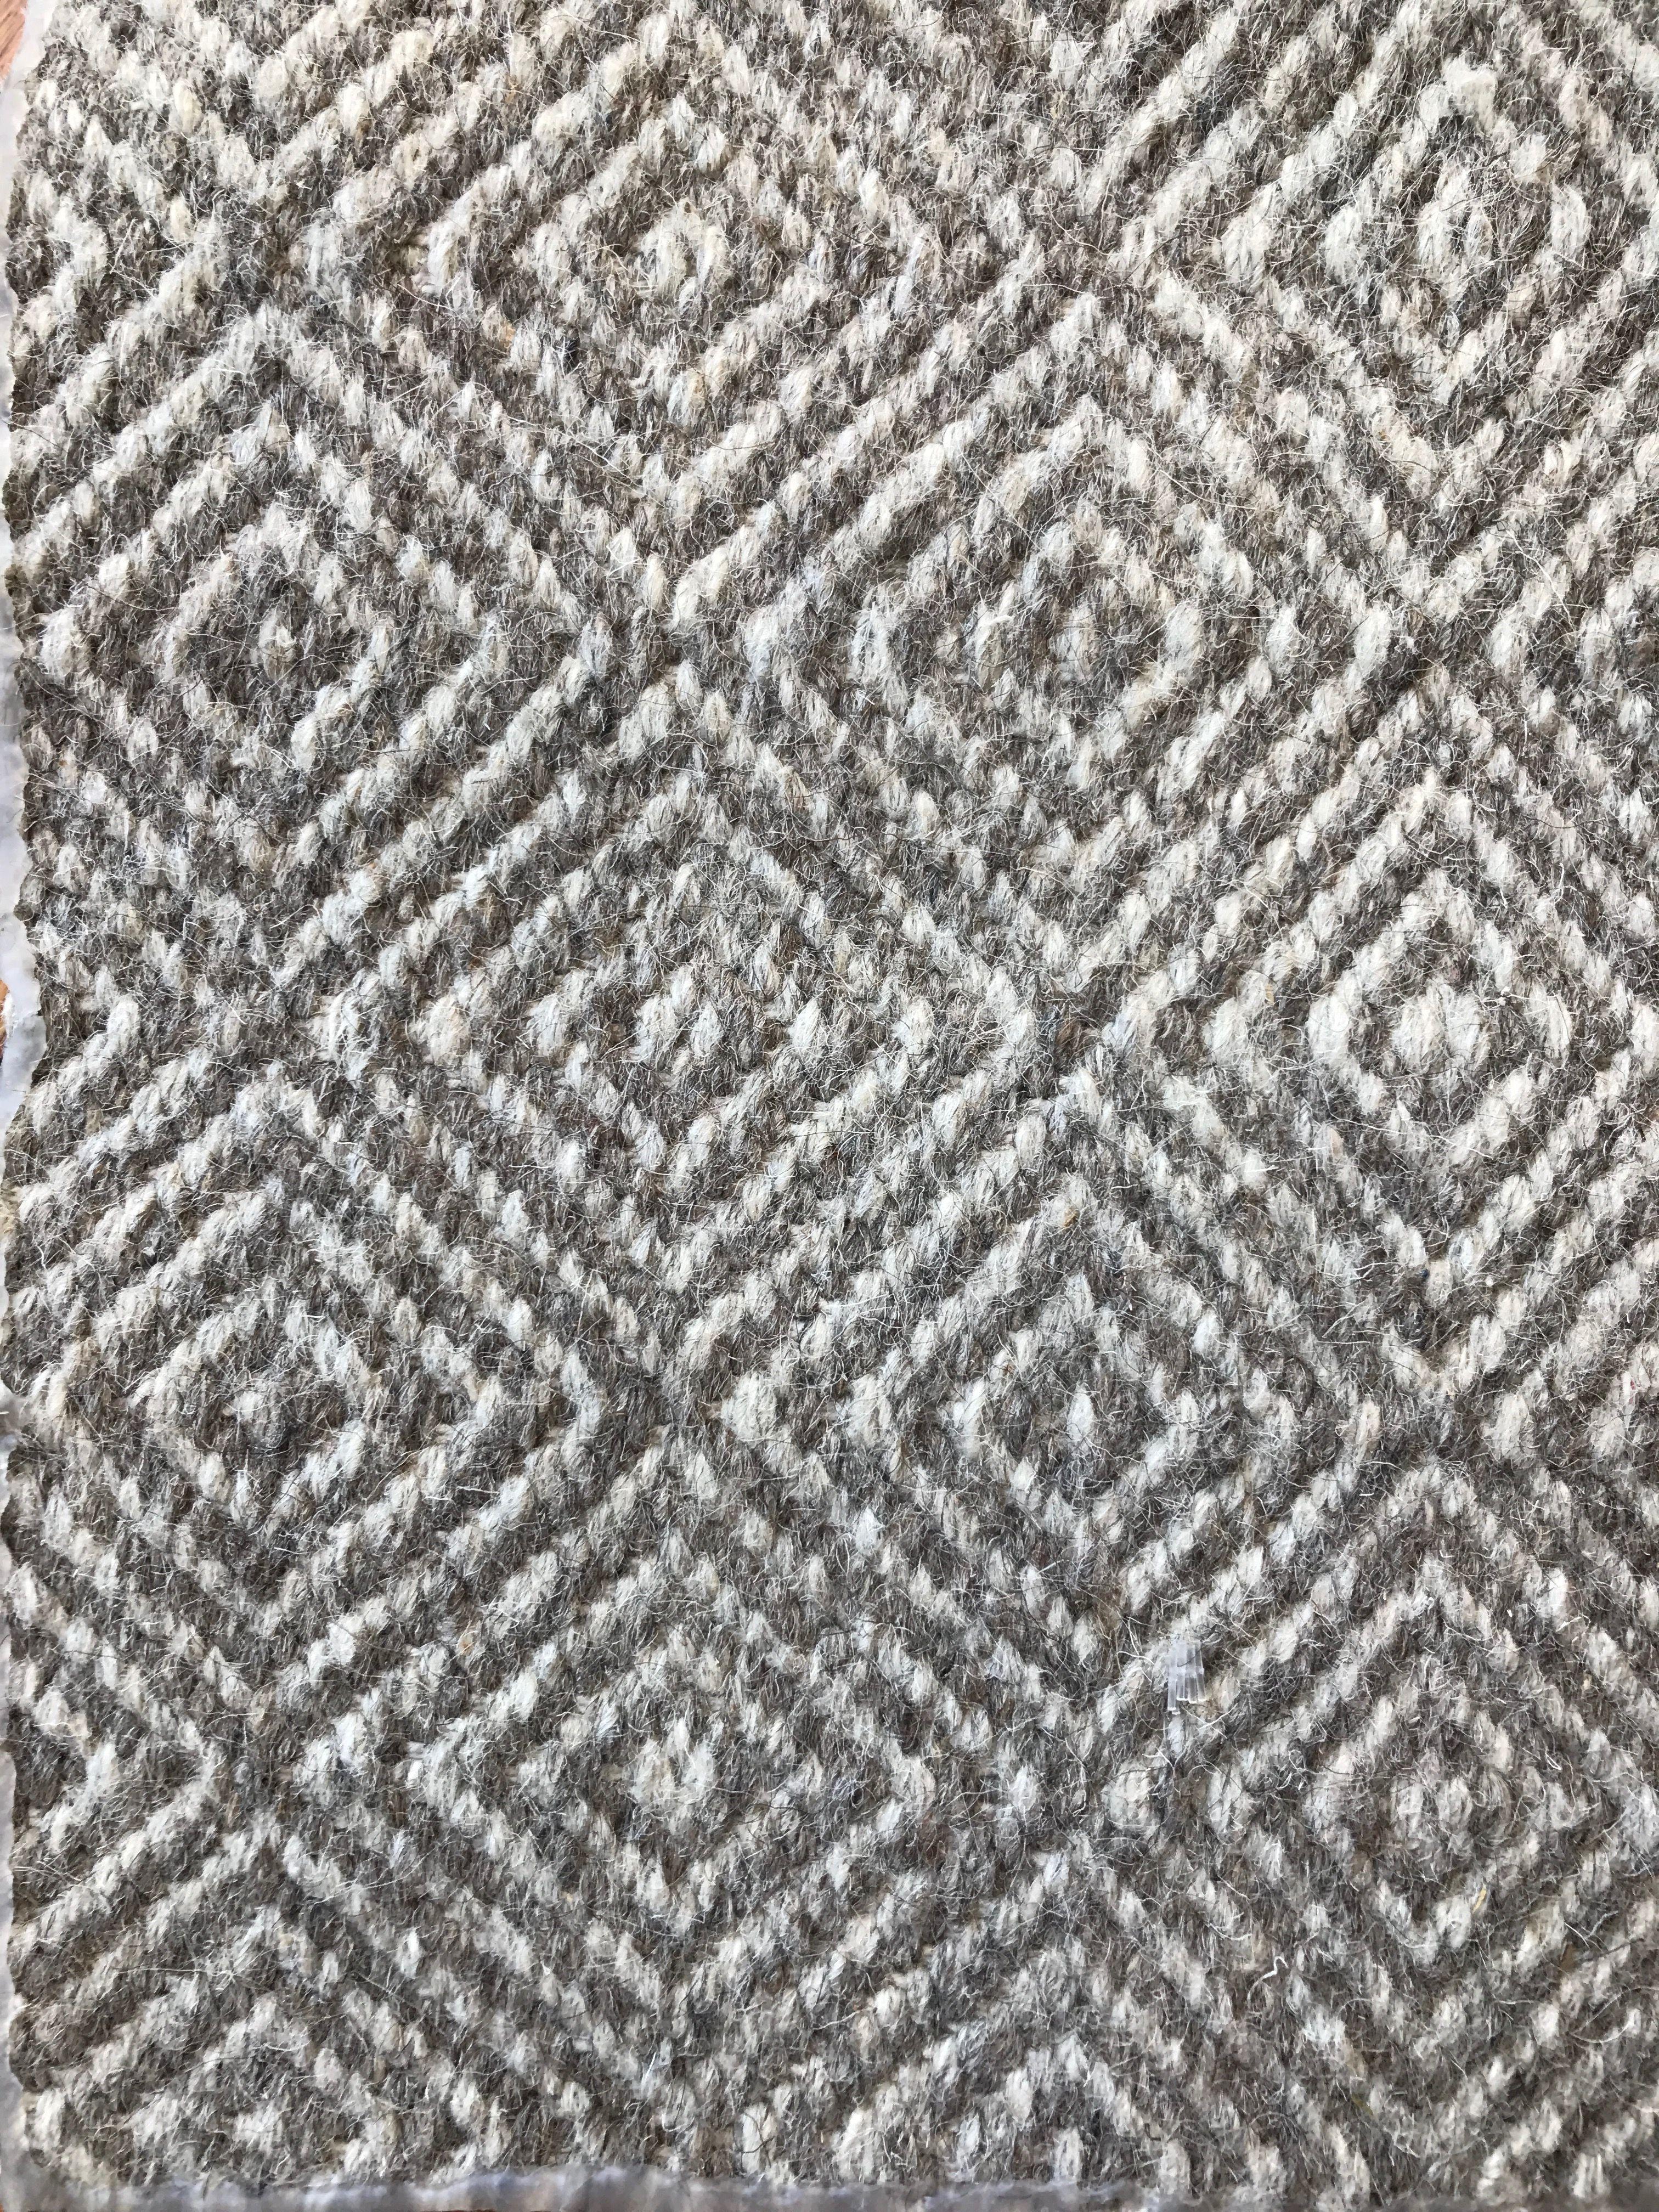 Graytaupe diamond flat weave fr rug option joiner goshawk ranch